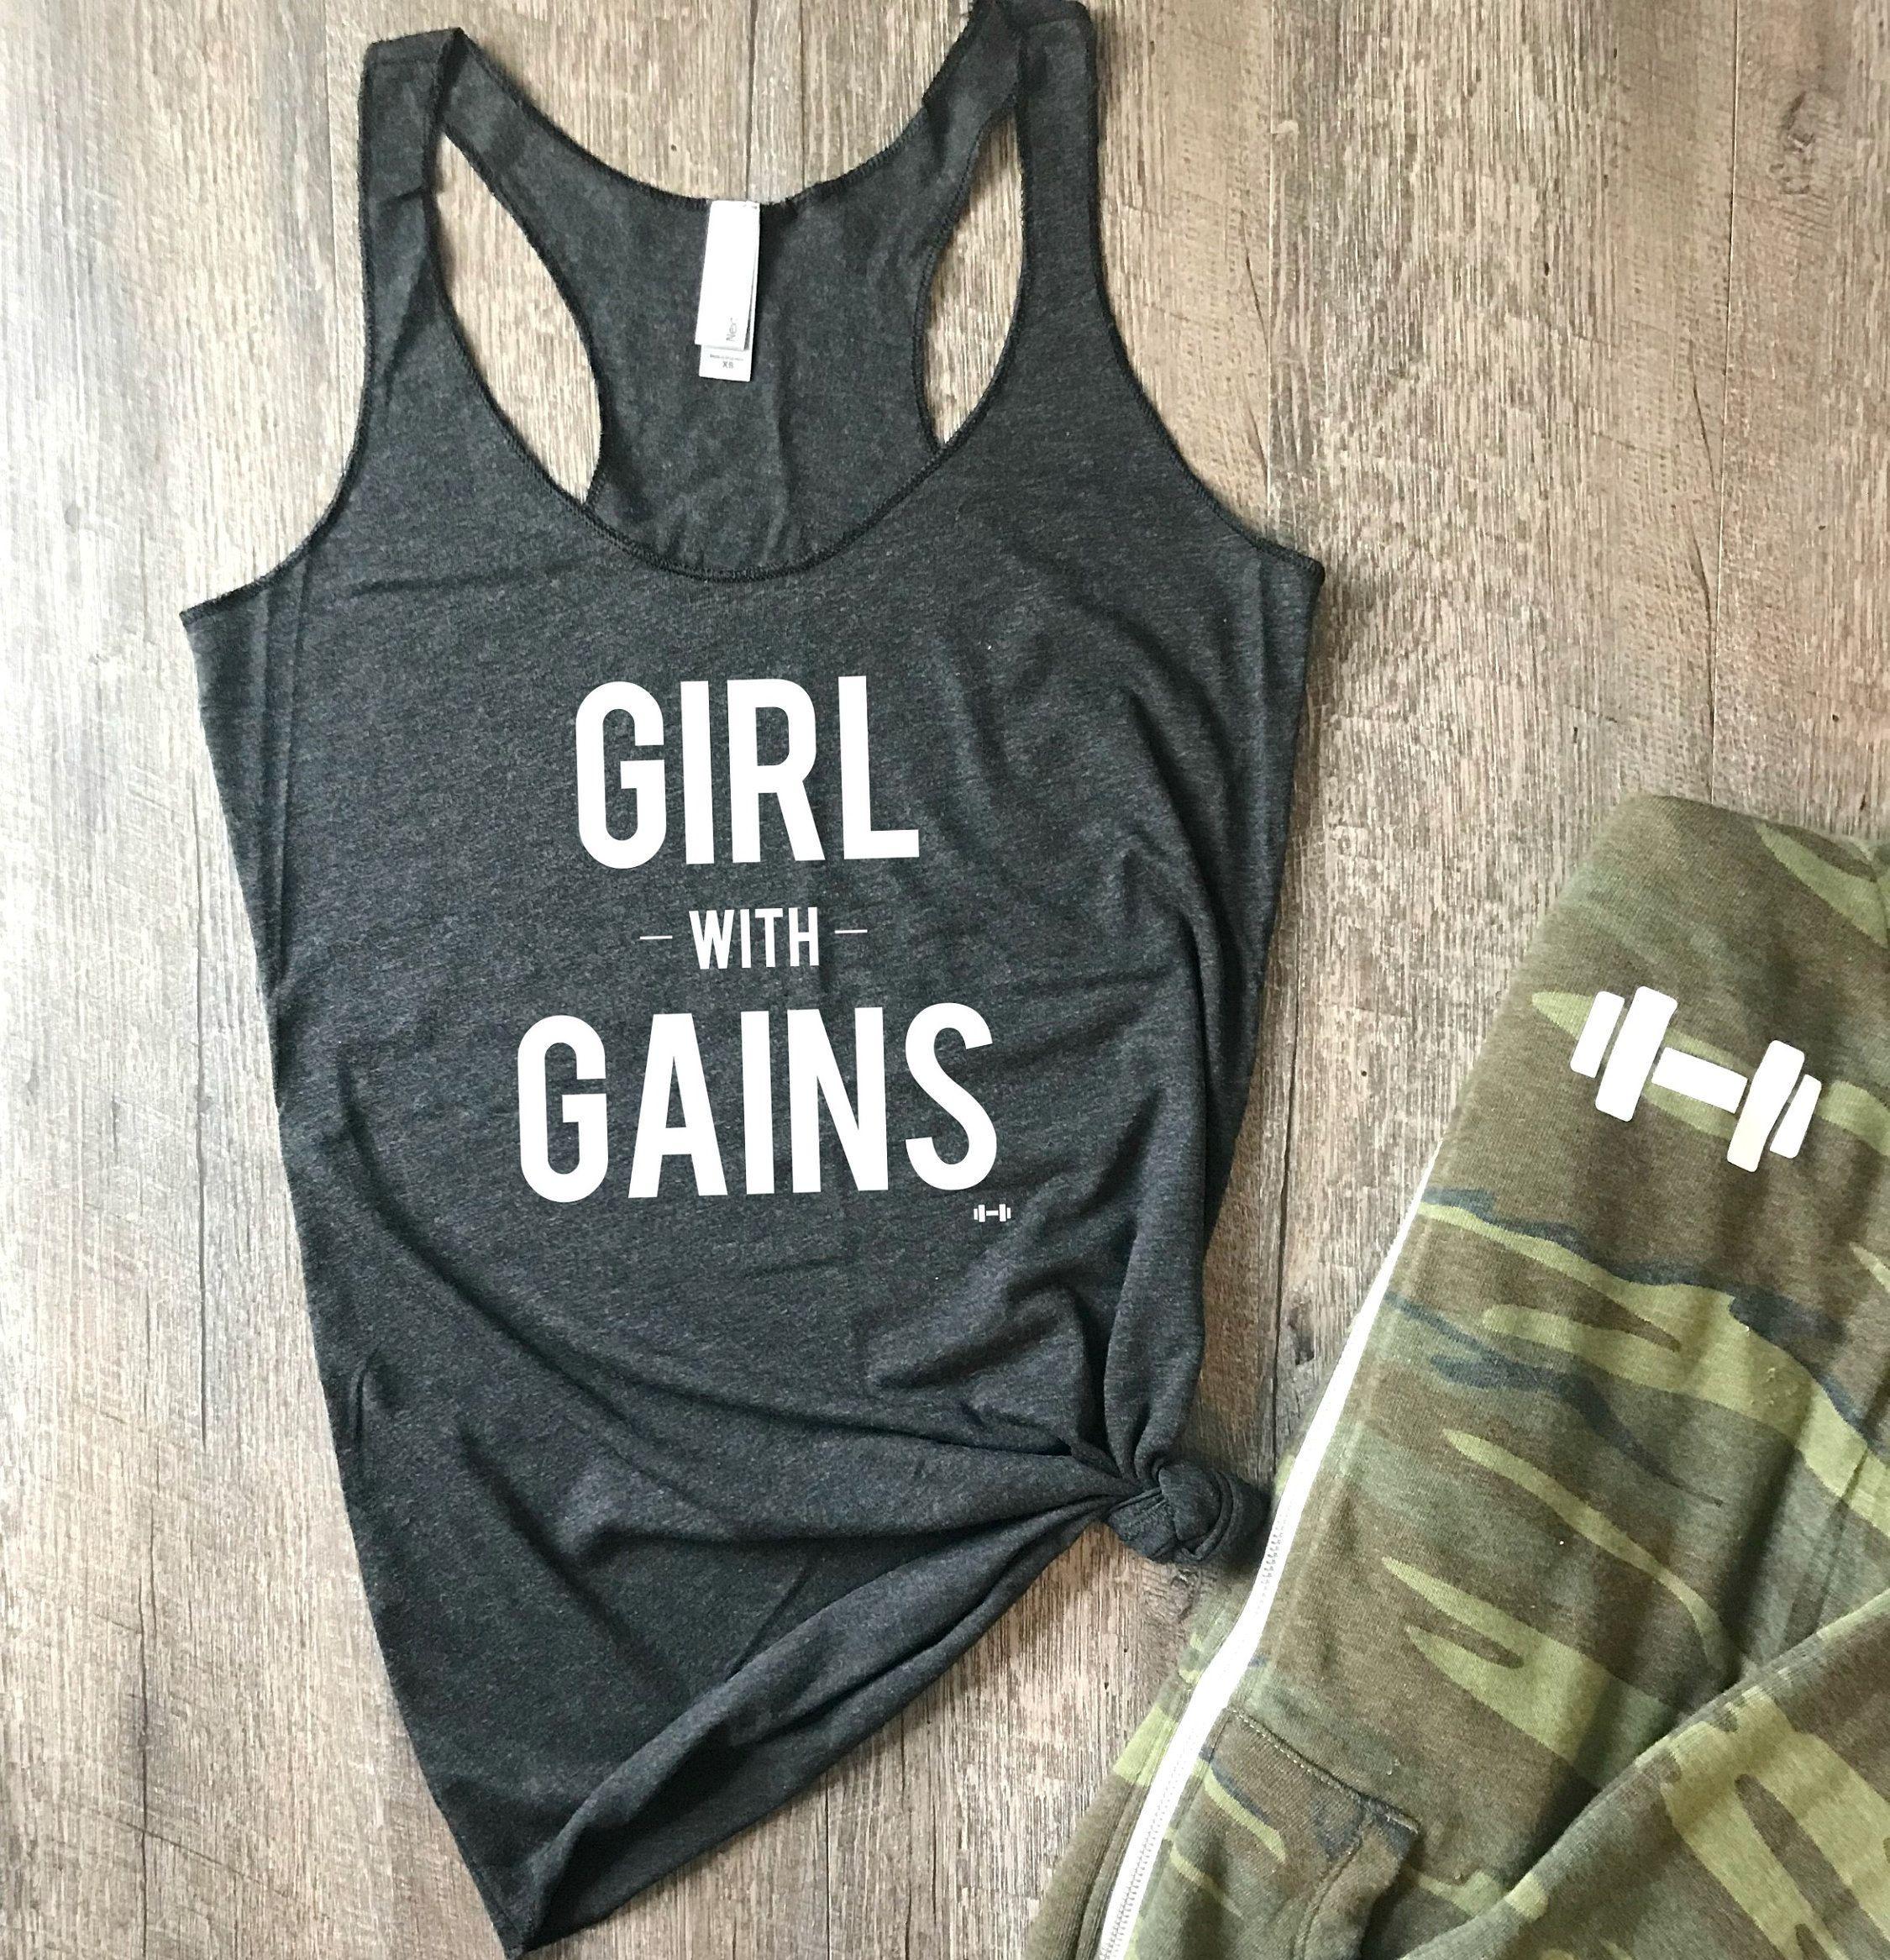 Lift Heavy Sh*it Unisex Tank Top,Funny Workout Shirt,Lift Heavy,Fitness Tank Top,Workout Tank,Fit Tee,Fitness,Lifting Tank,Sport Shirt